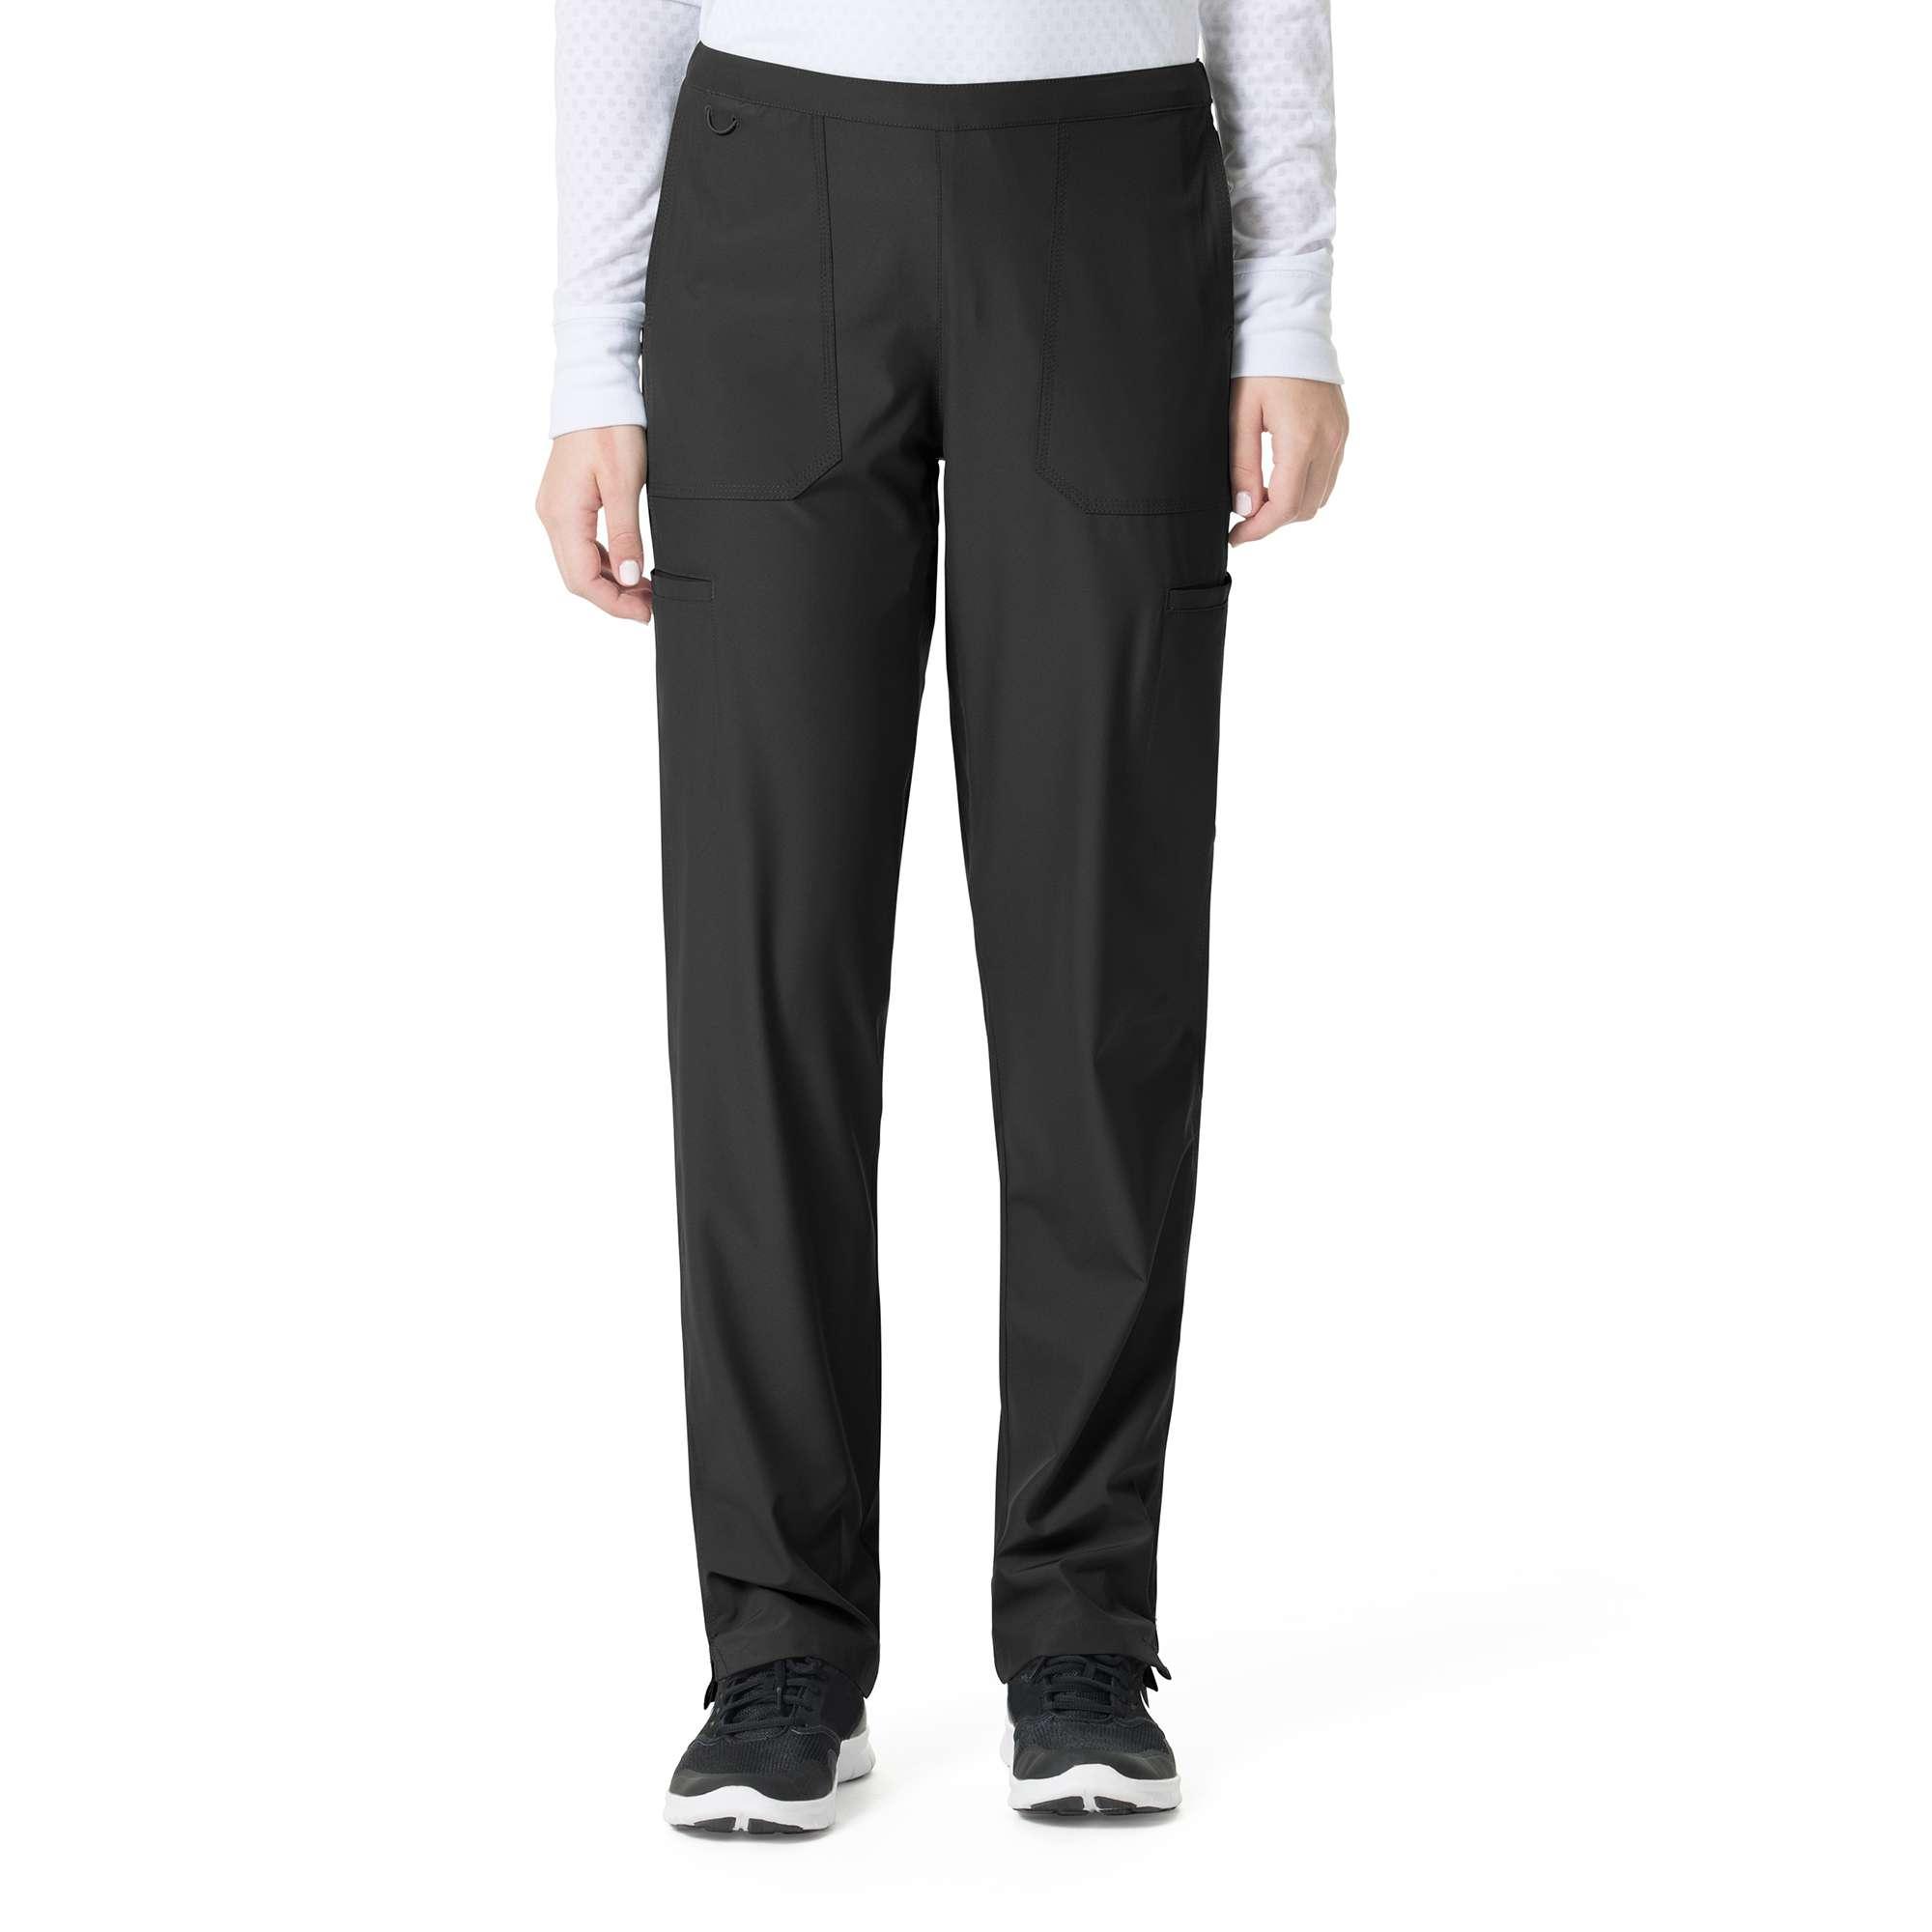 Carhartt Flat Front Straight Leg Pant